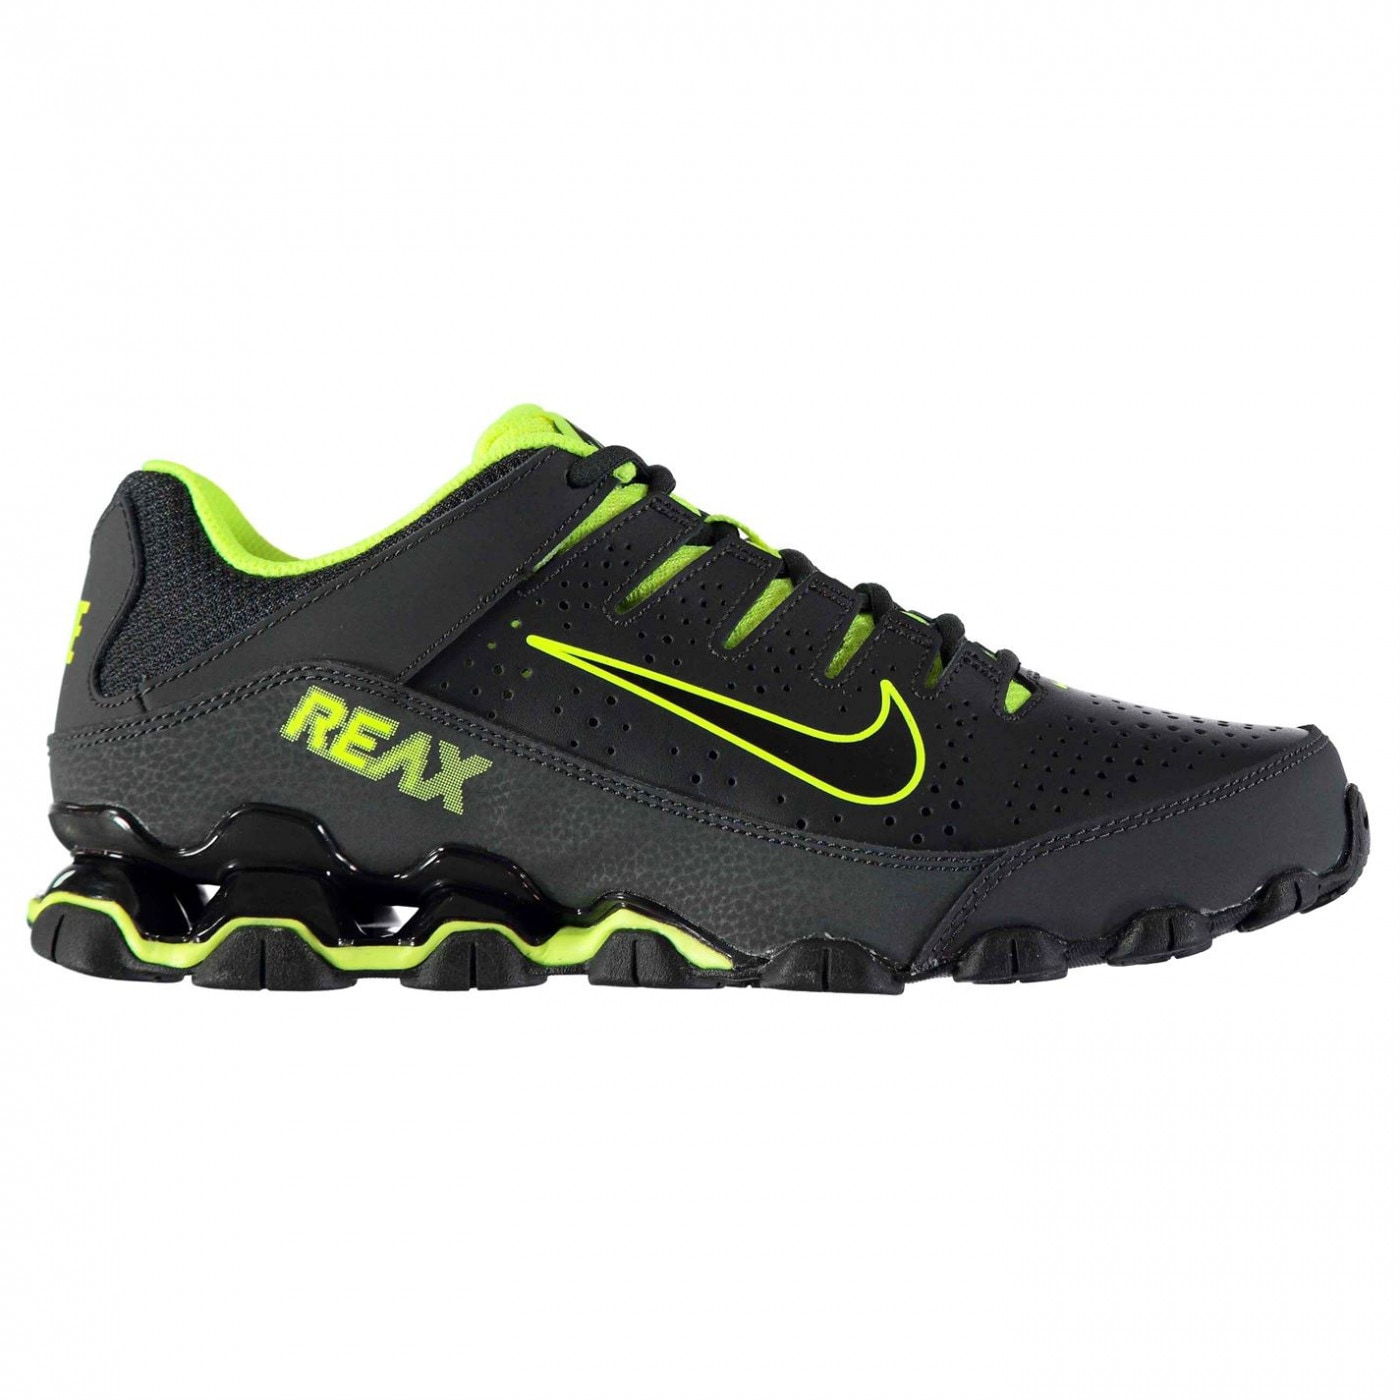 b69335cd279a Nike Reax 8 Training Shoes Mens - FACTCOOL